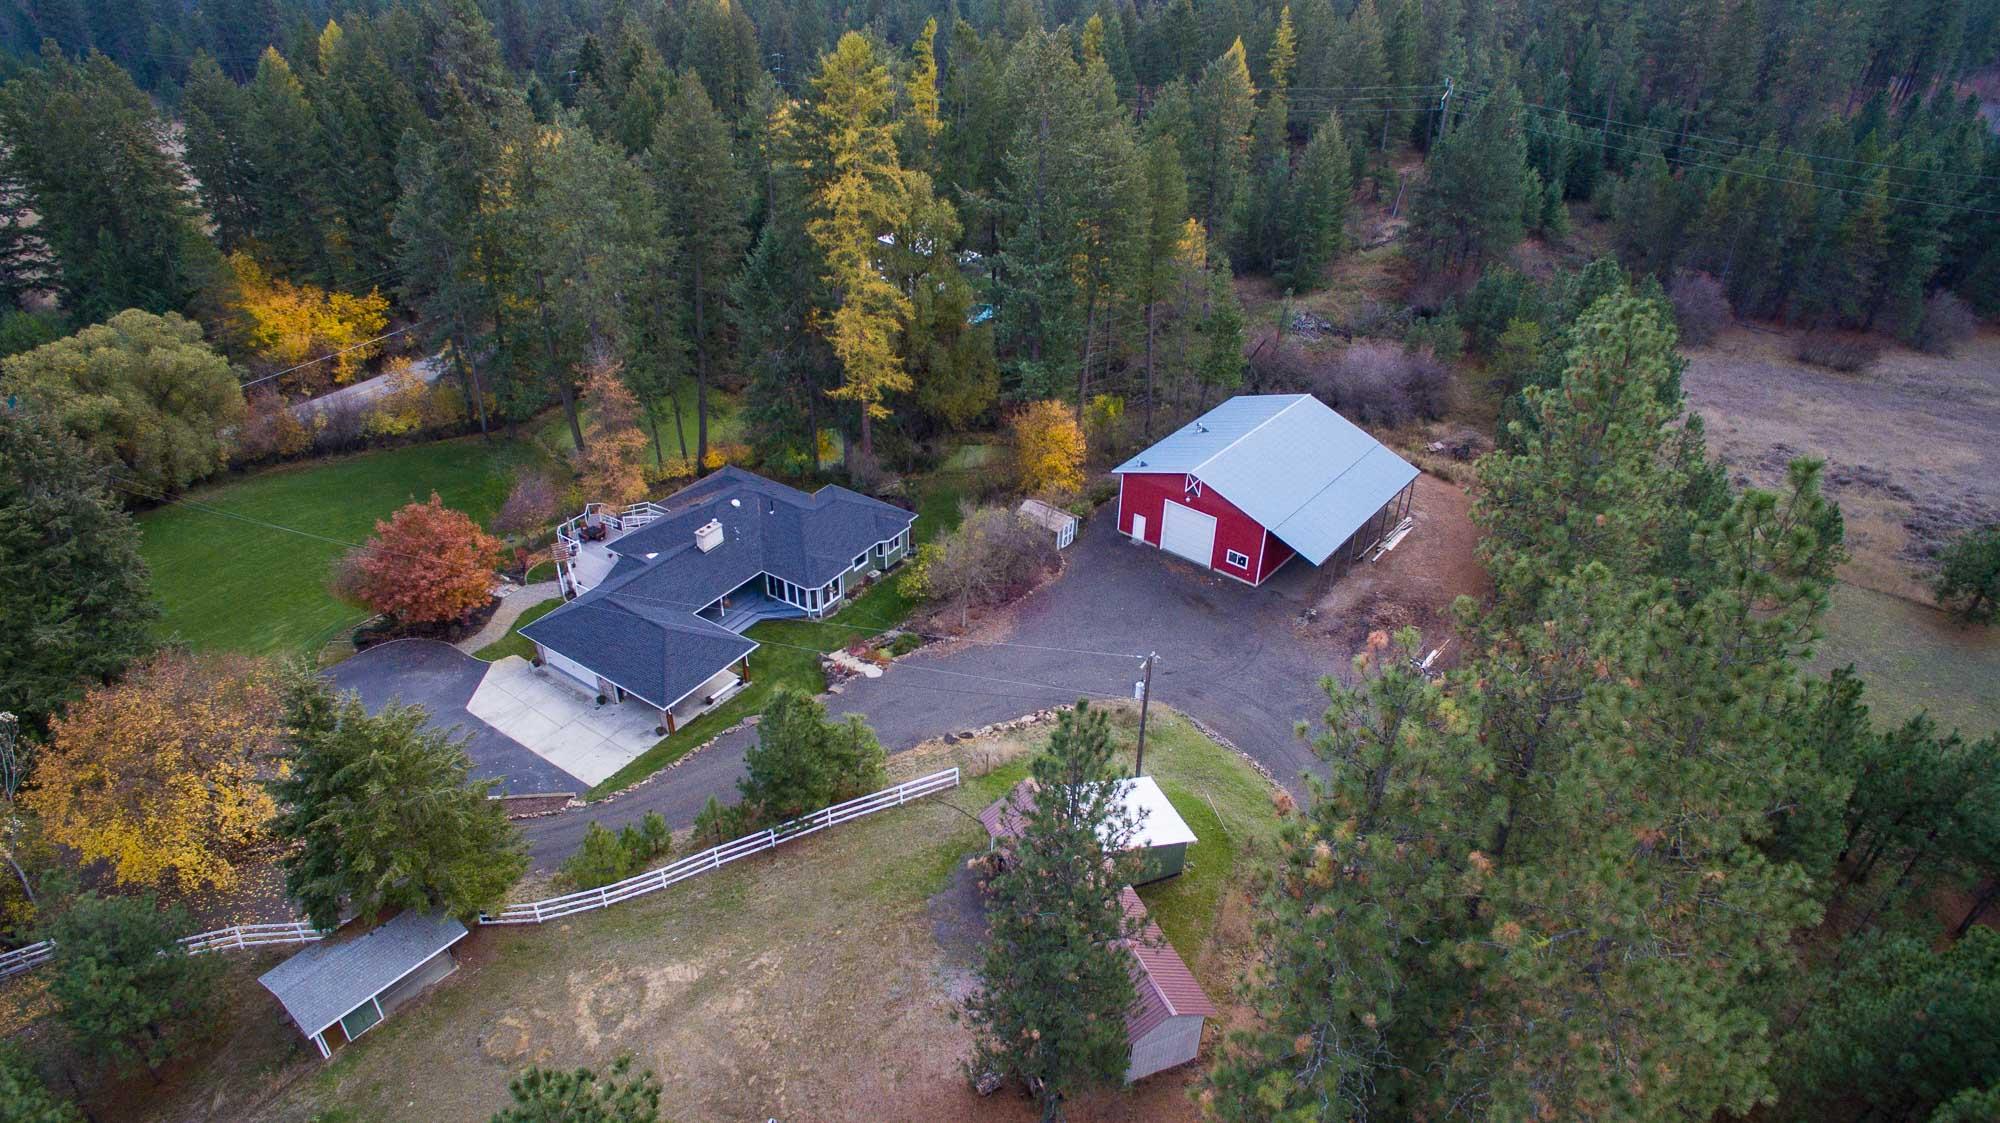 Drone Photo of North Spokane Real Estate Listing